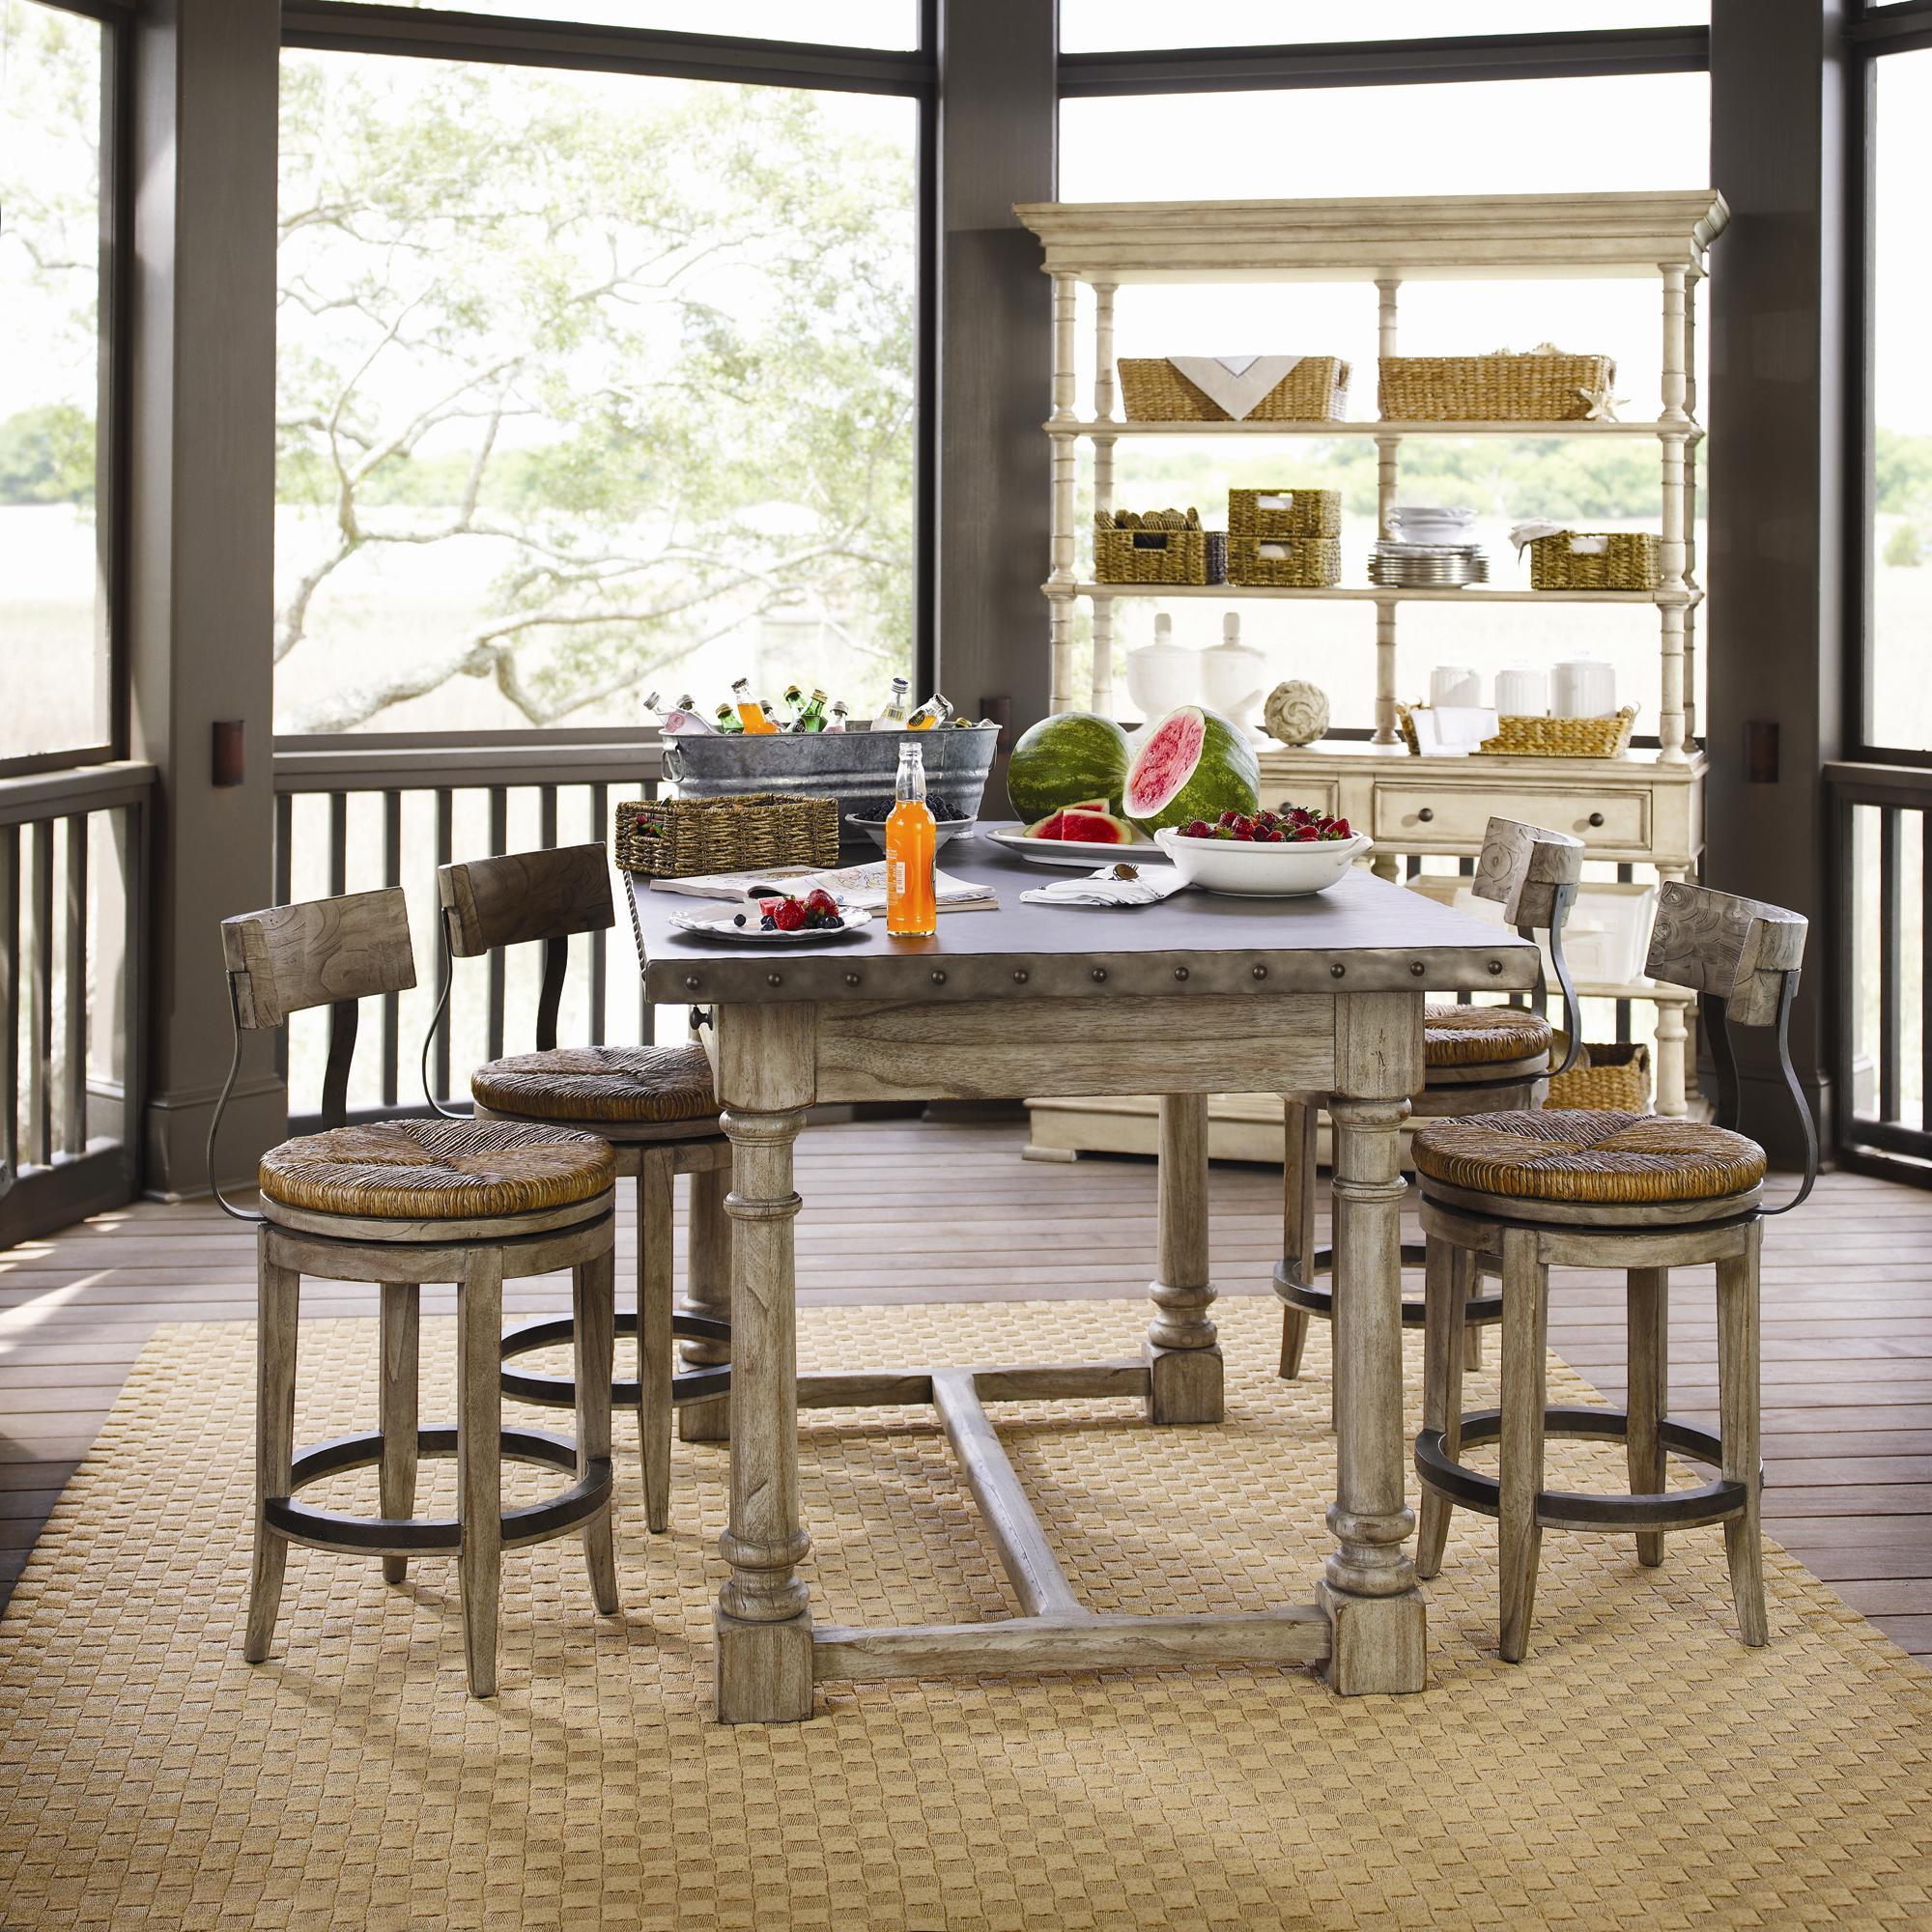 Lexington Twilight Bay 5 Piece Shelter Island Bistro Table Dalton Counter Stools Set John V